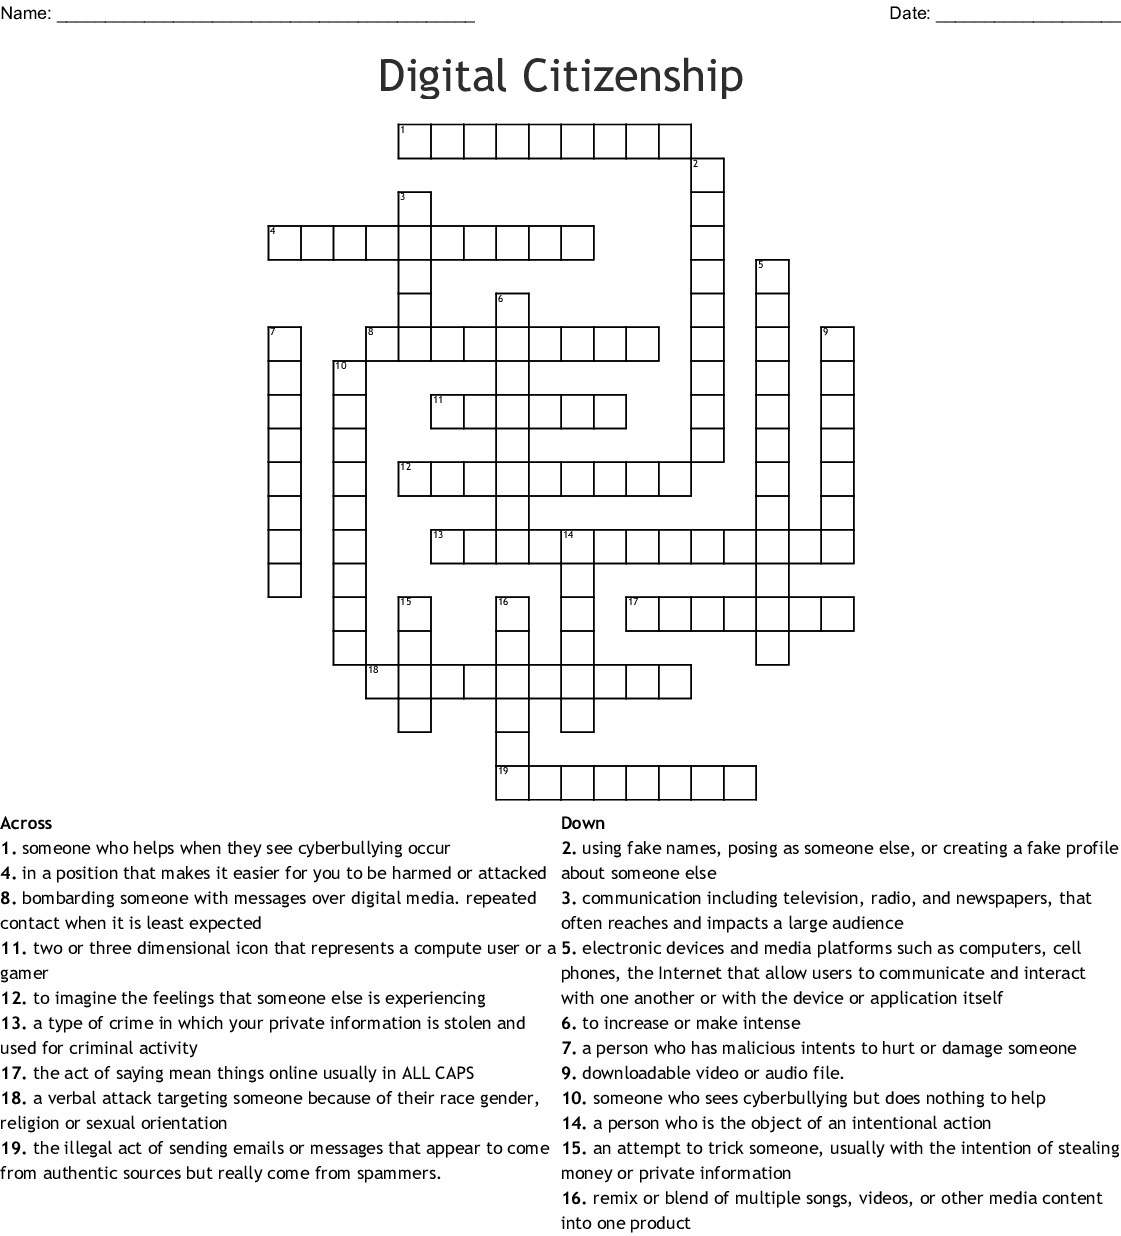 Digital Citizenship crossword - WordMint